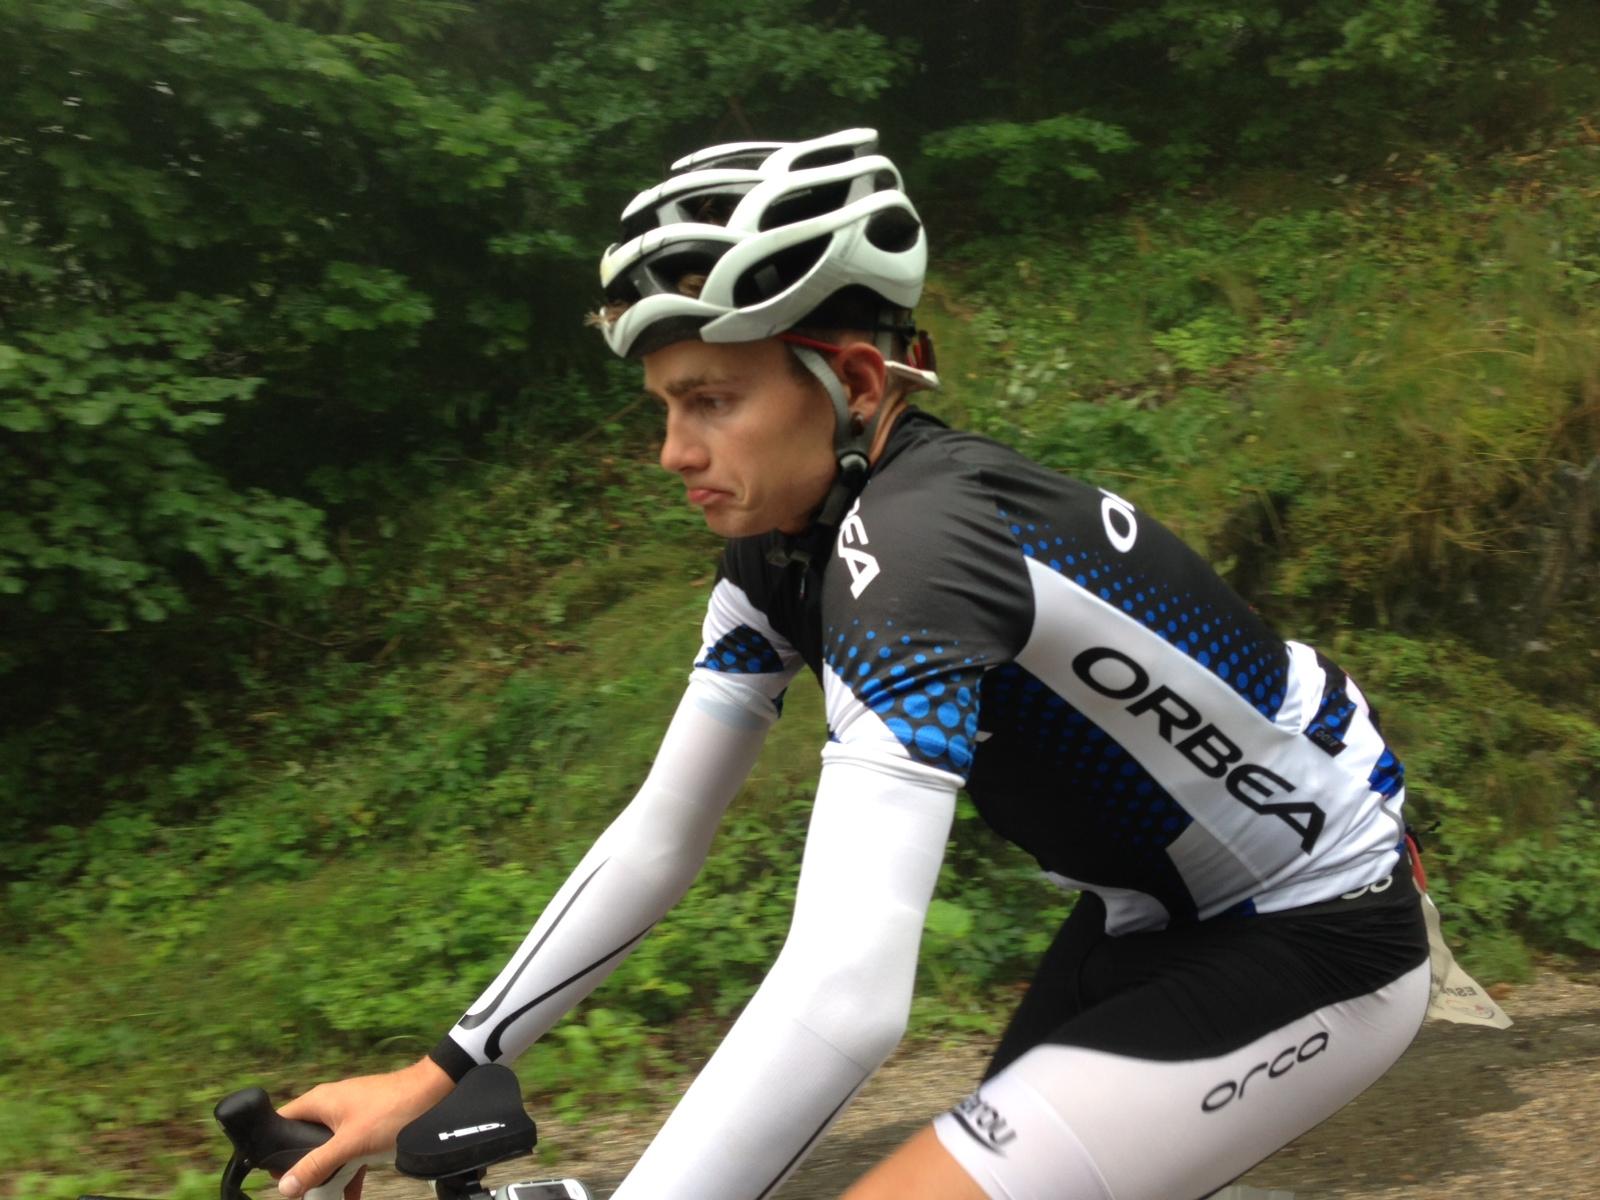 ALPE D'HUEZ : Alberto Moreno produit son effort dans l'ascension du col du Grand Serre